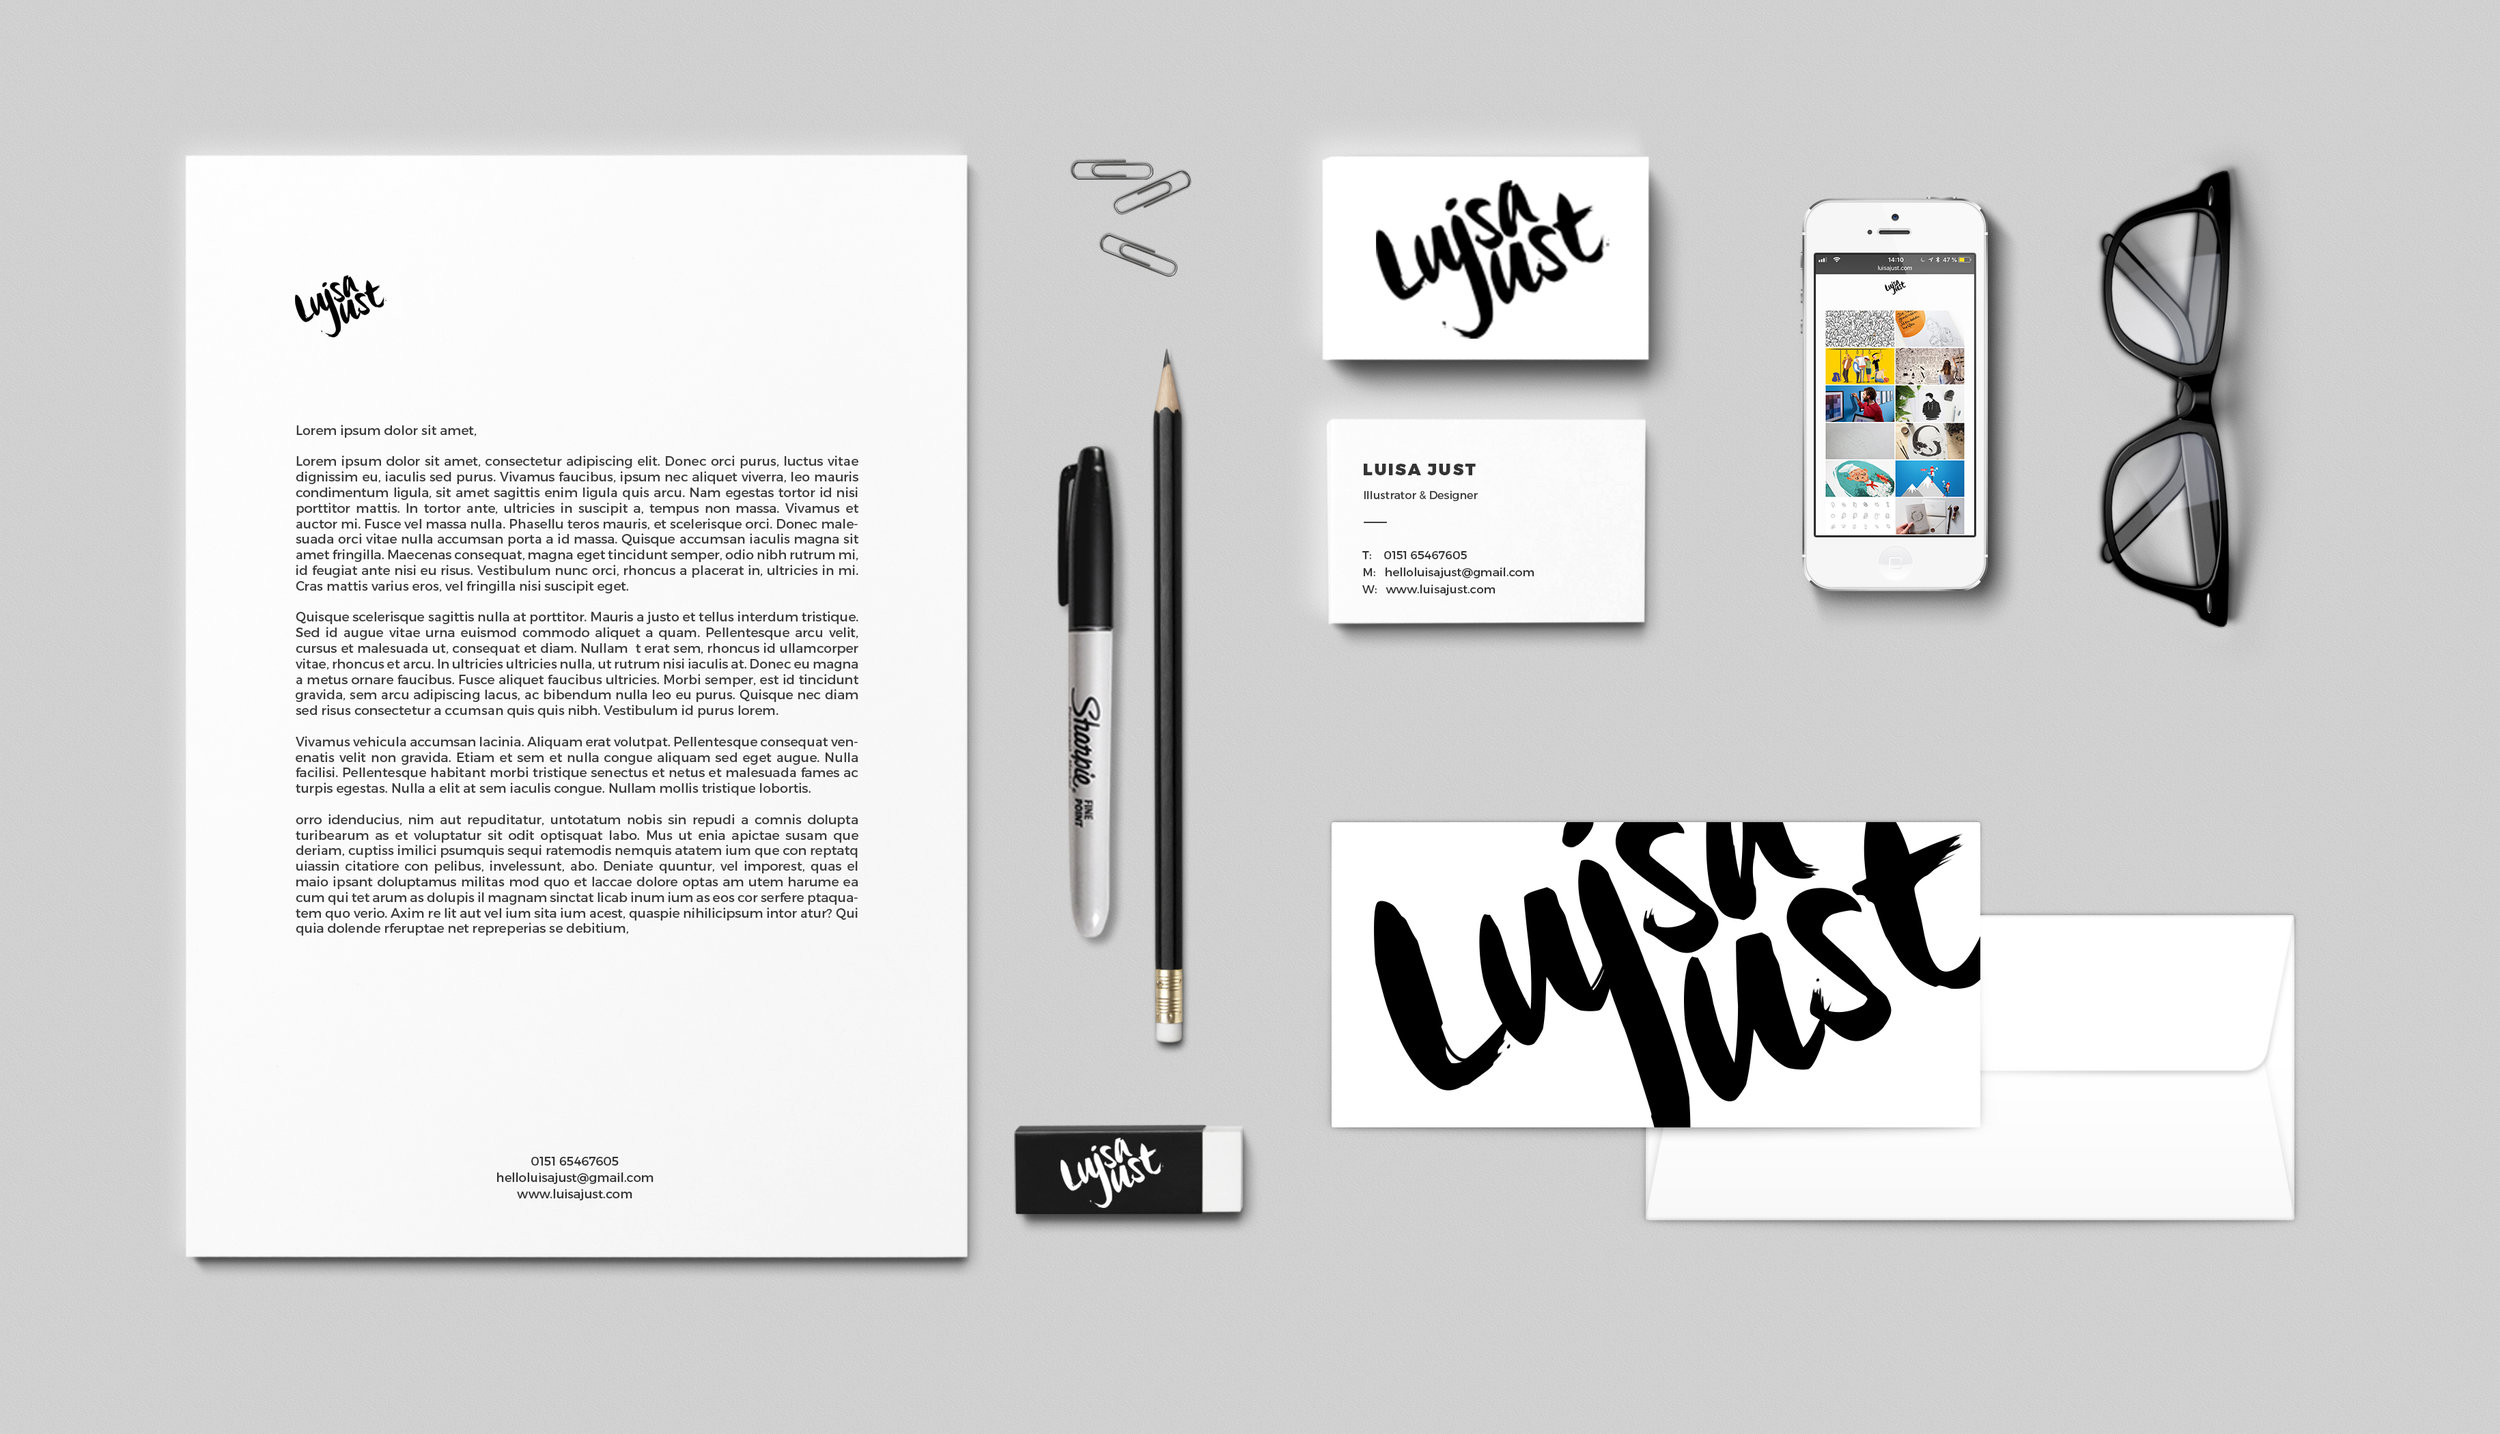 luisajust_branding Kopie.jpg